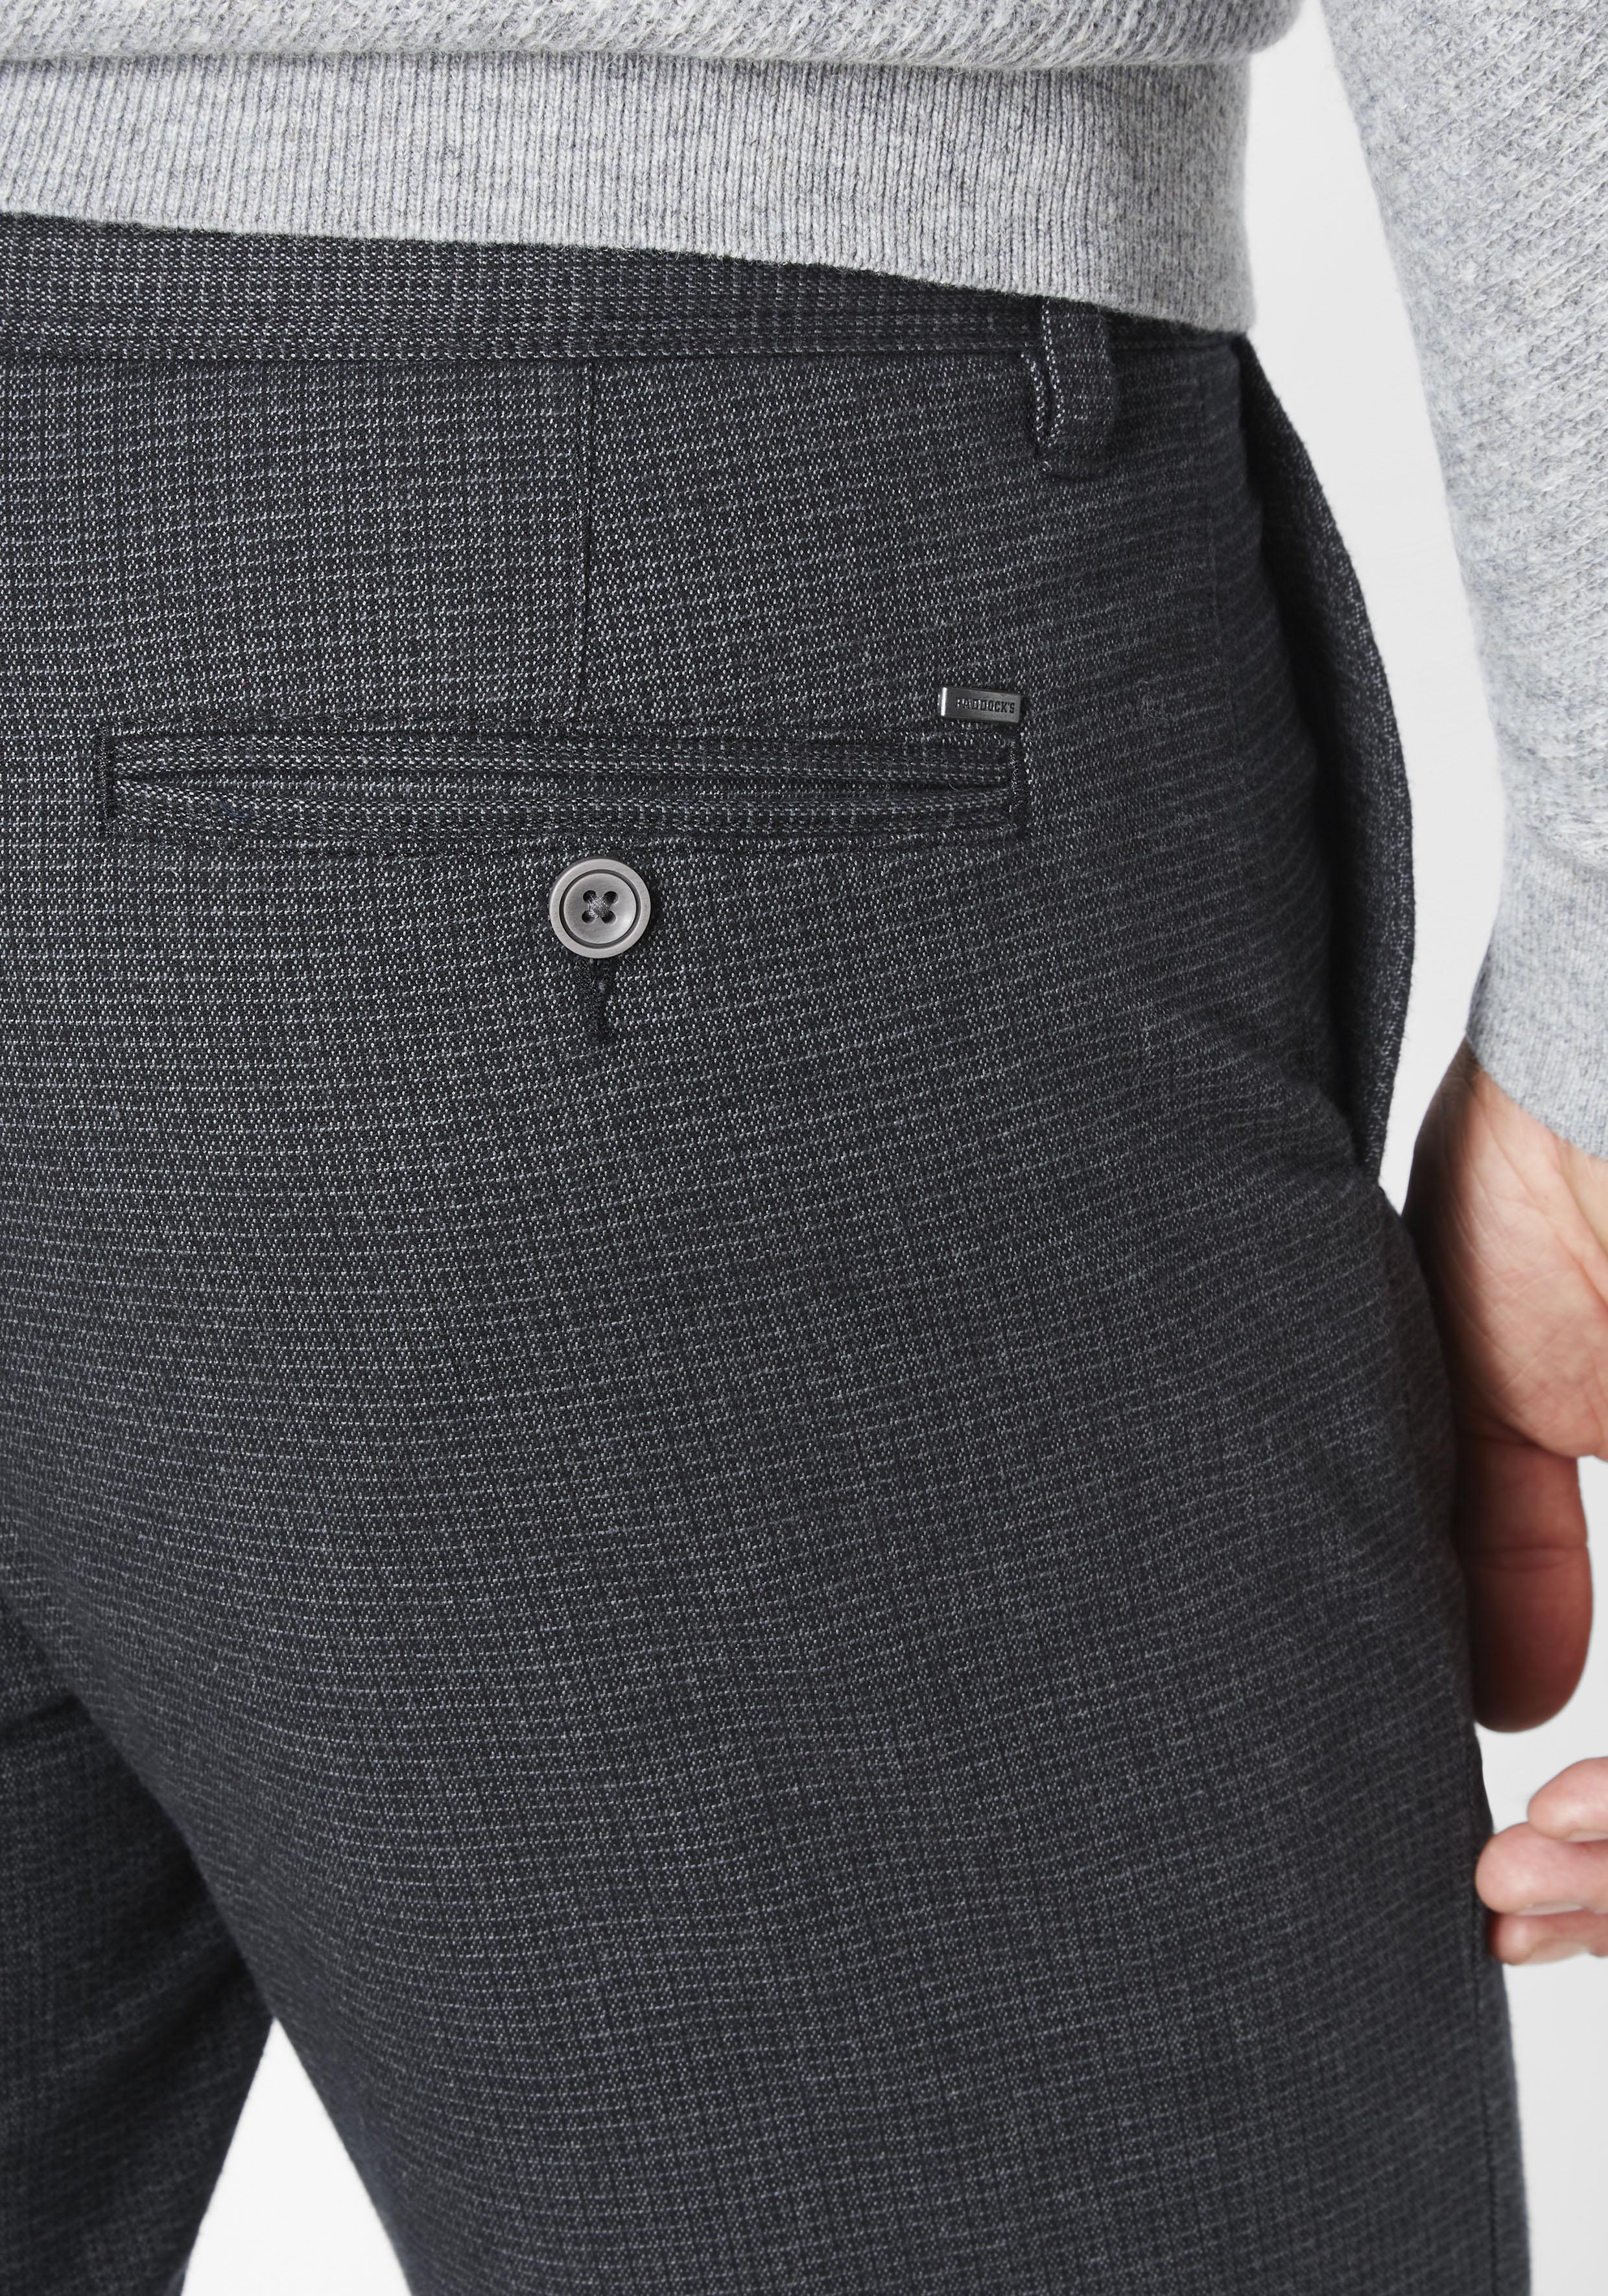 Paddock's Chino Codie Wool Look